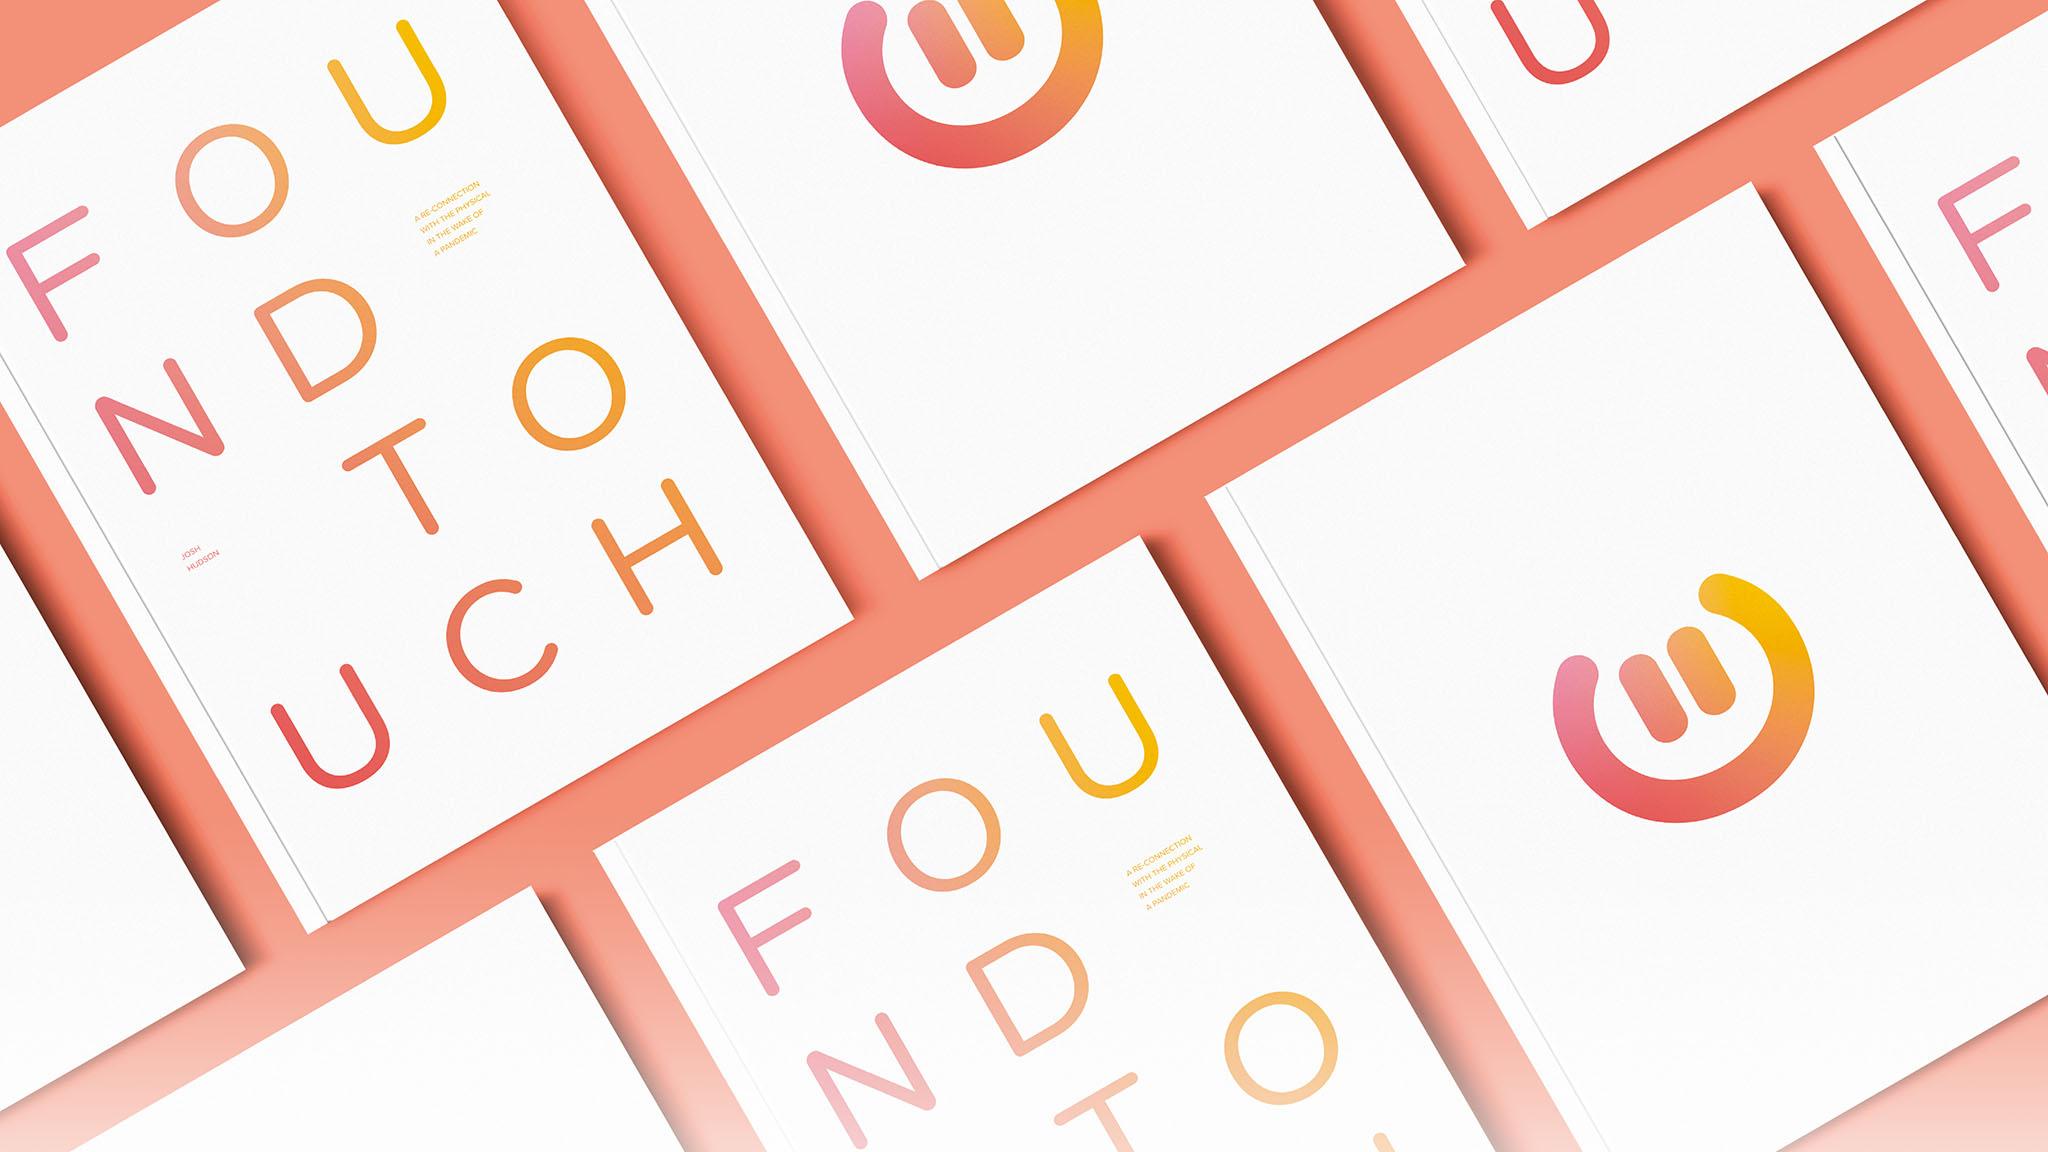 Josh Aaron Hudson Graphics and Design